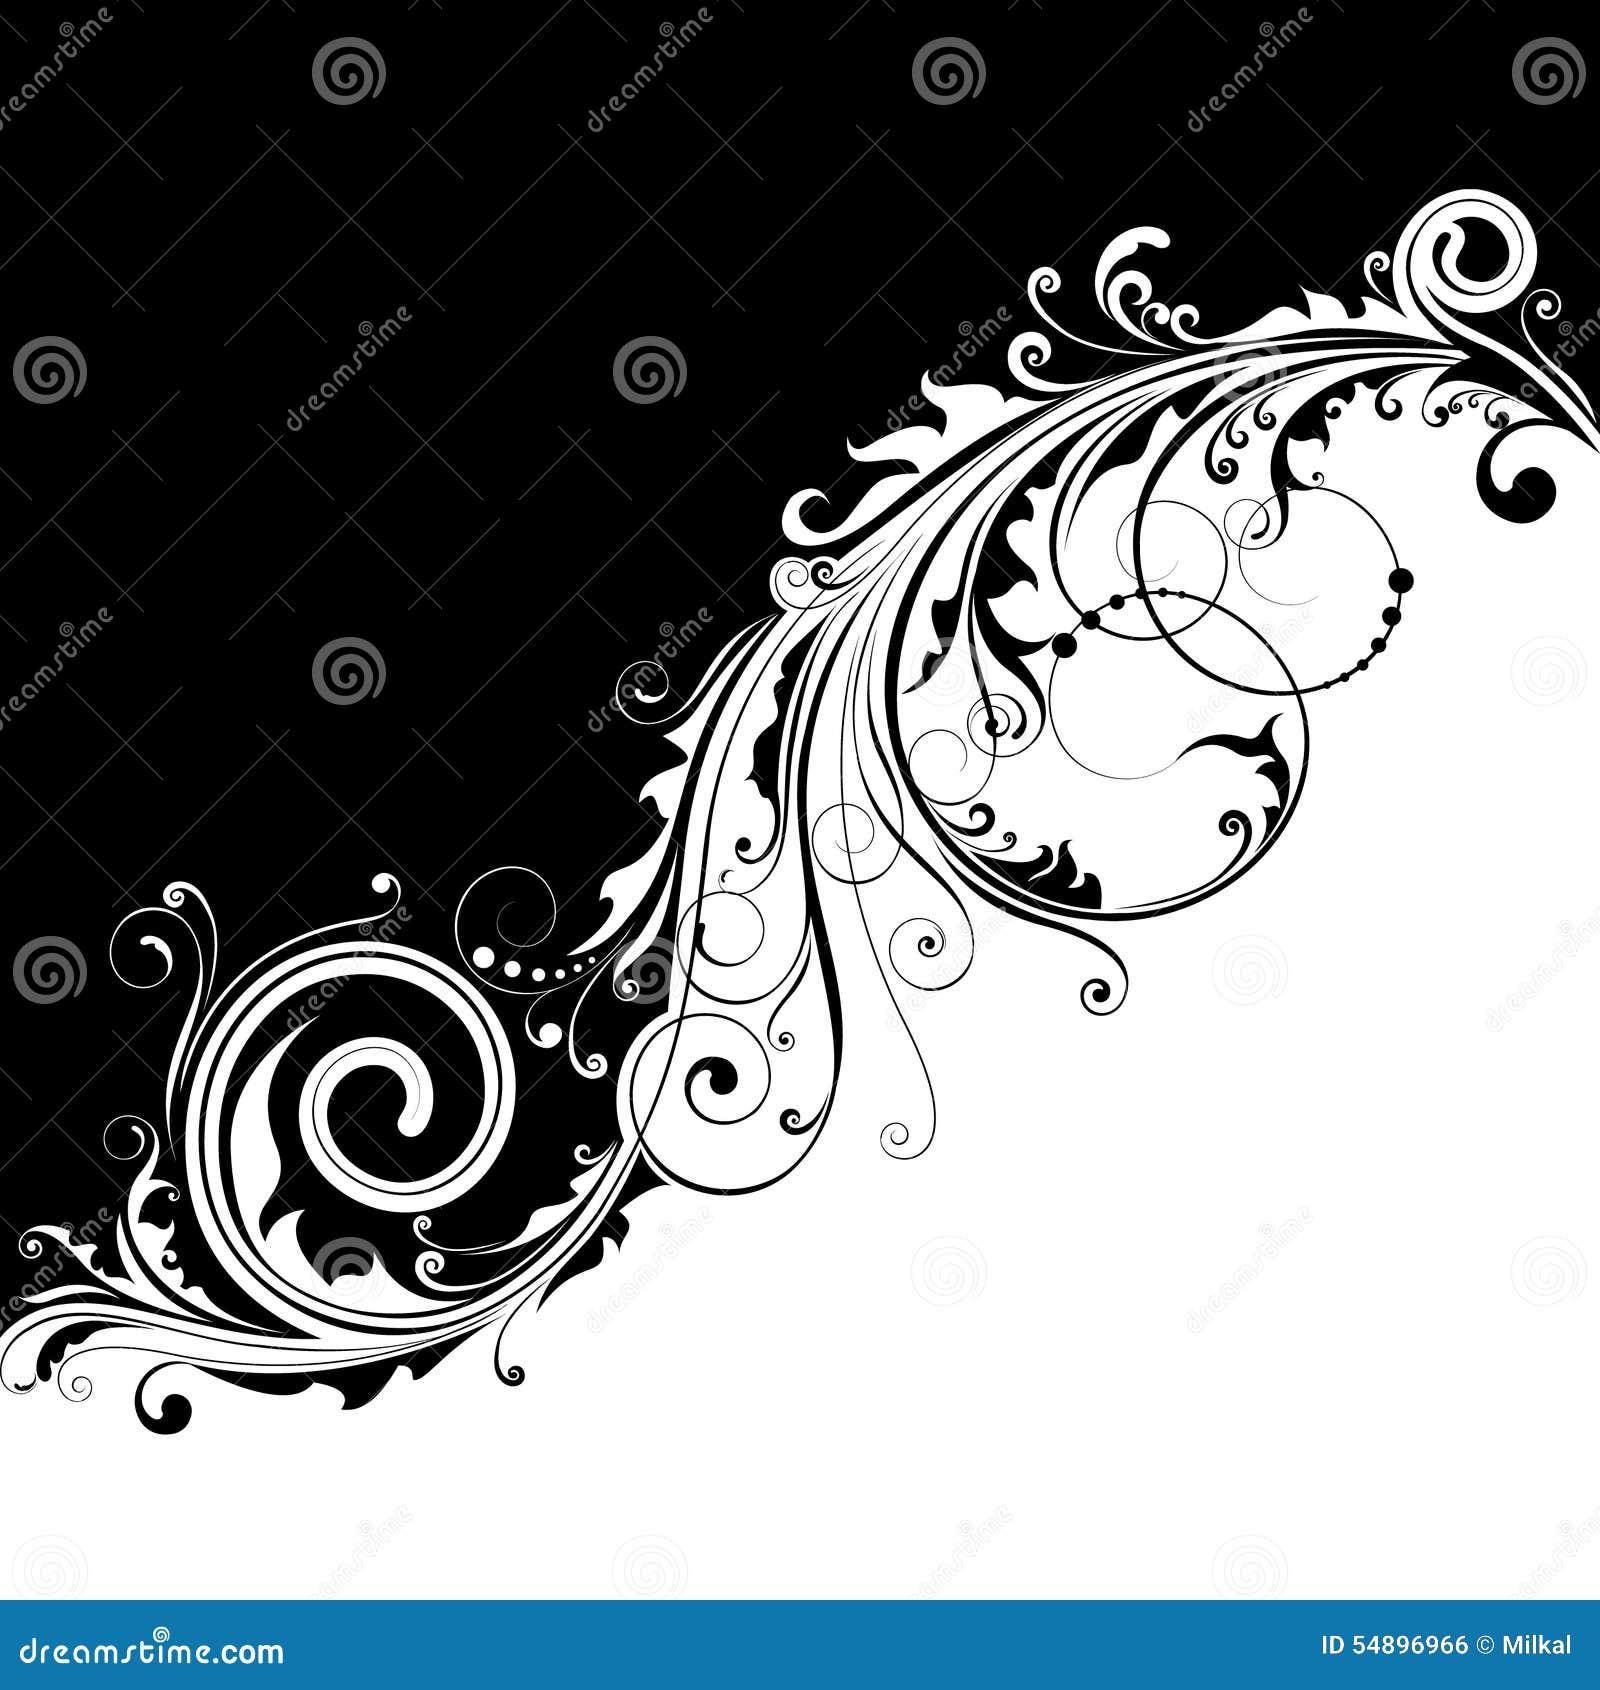 Black Corner Swirls Designs